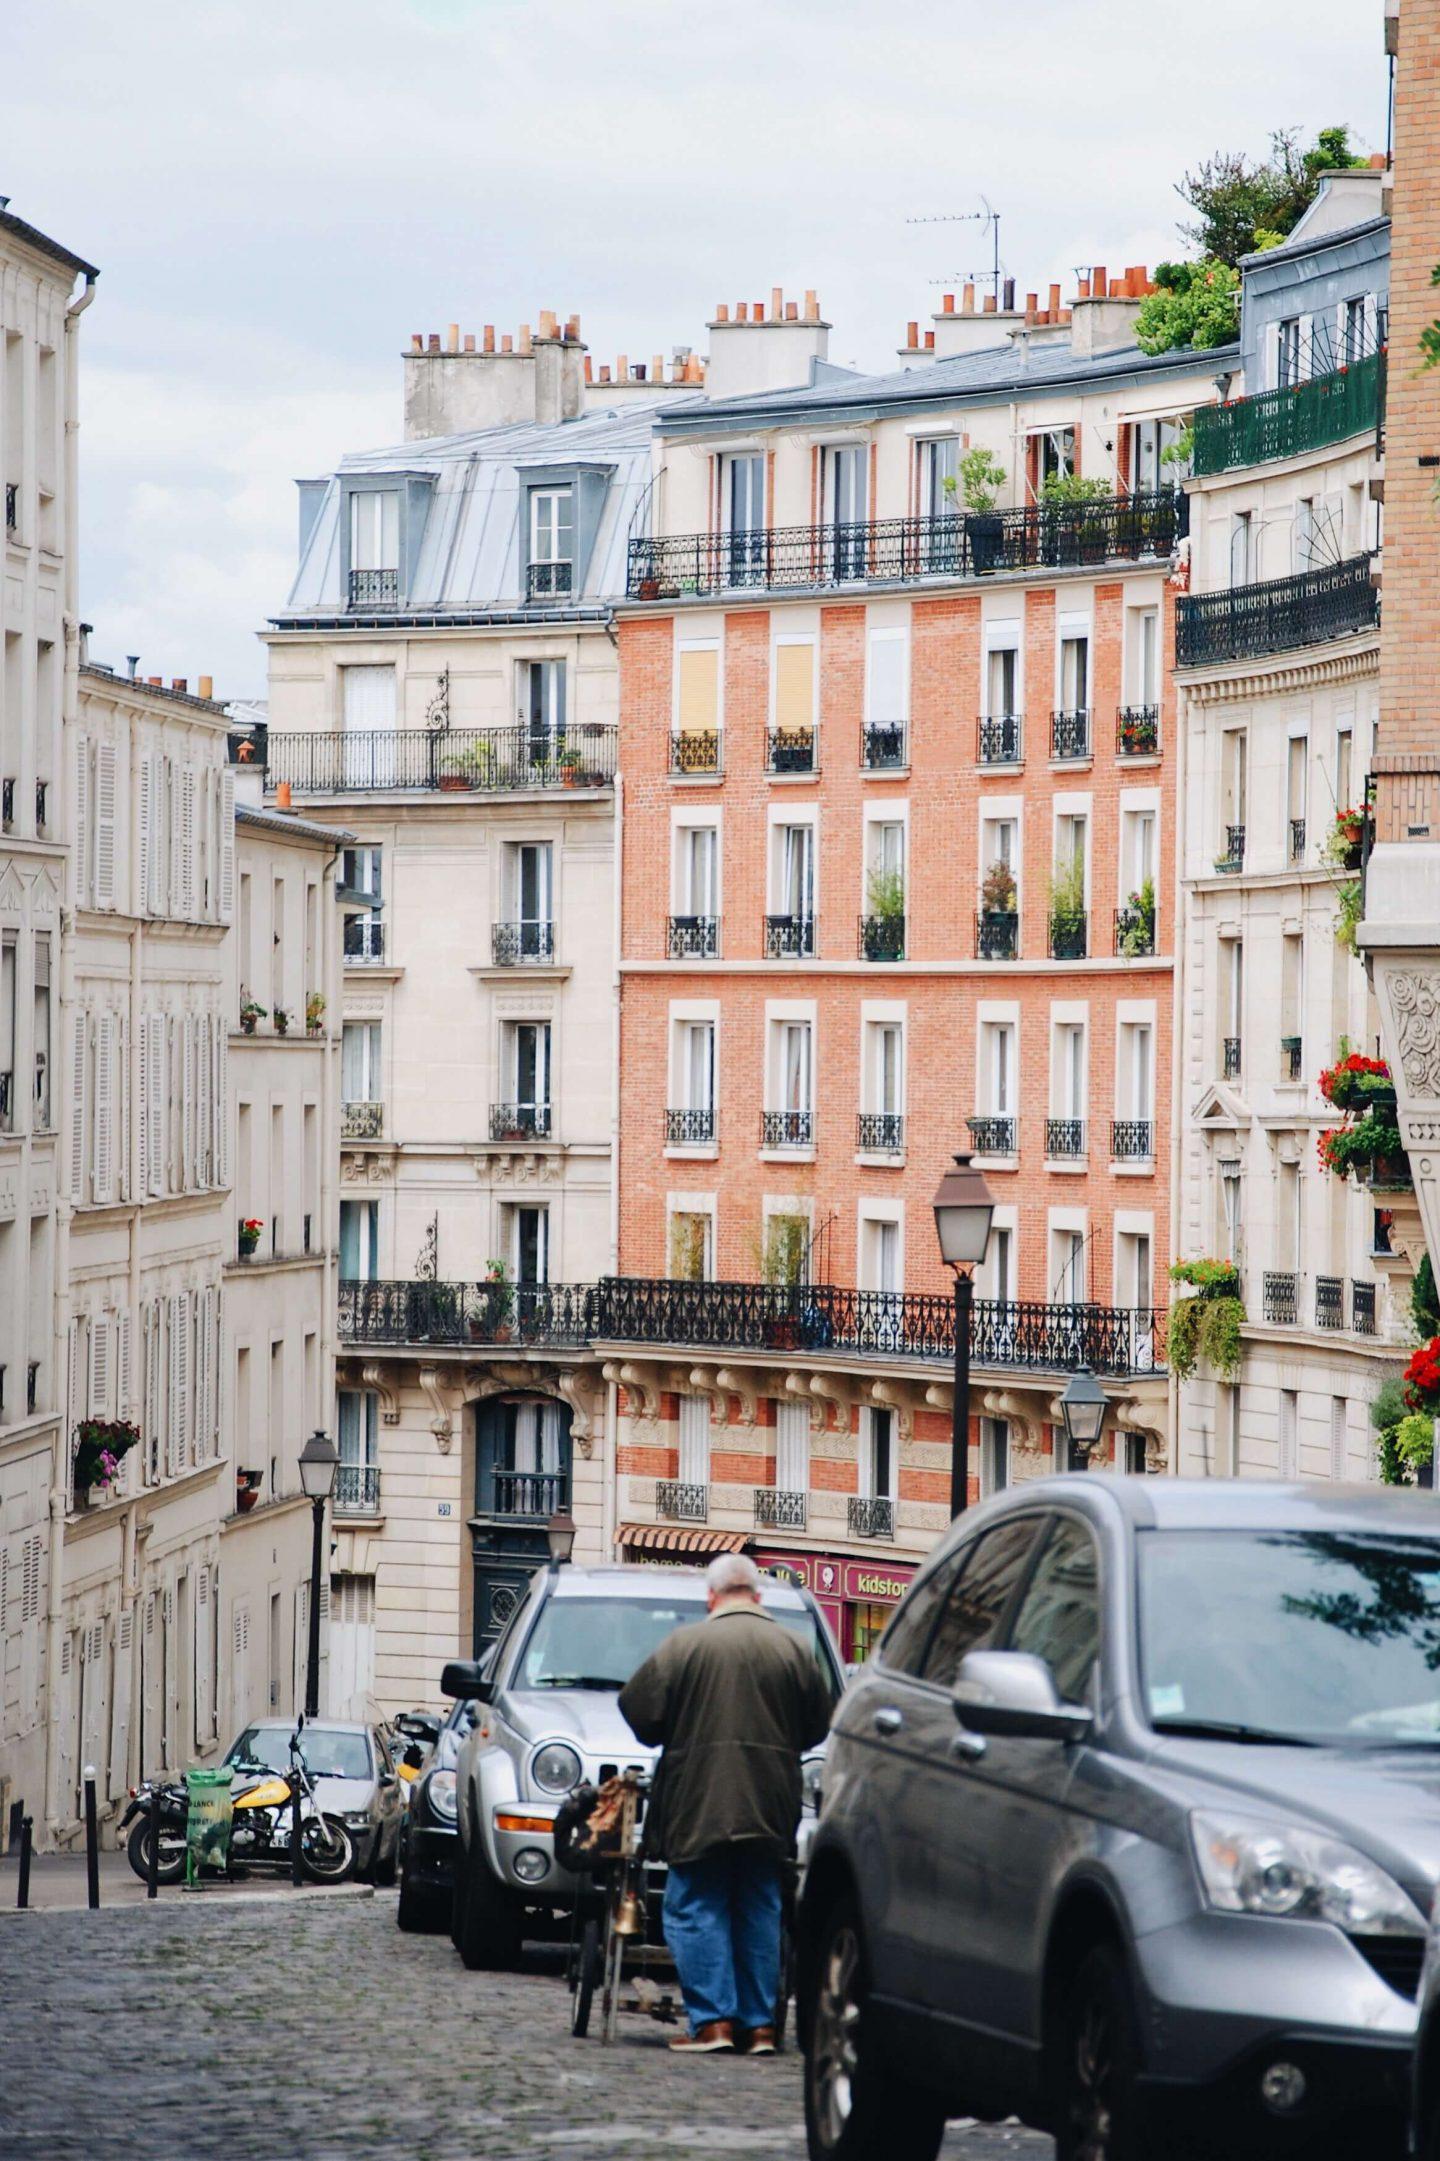 things to do in paris, bucket list experiences, paris city in france, street in paris, houses